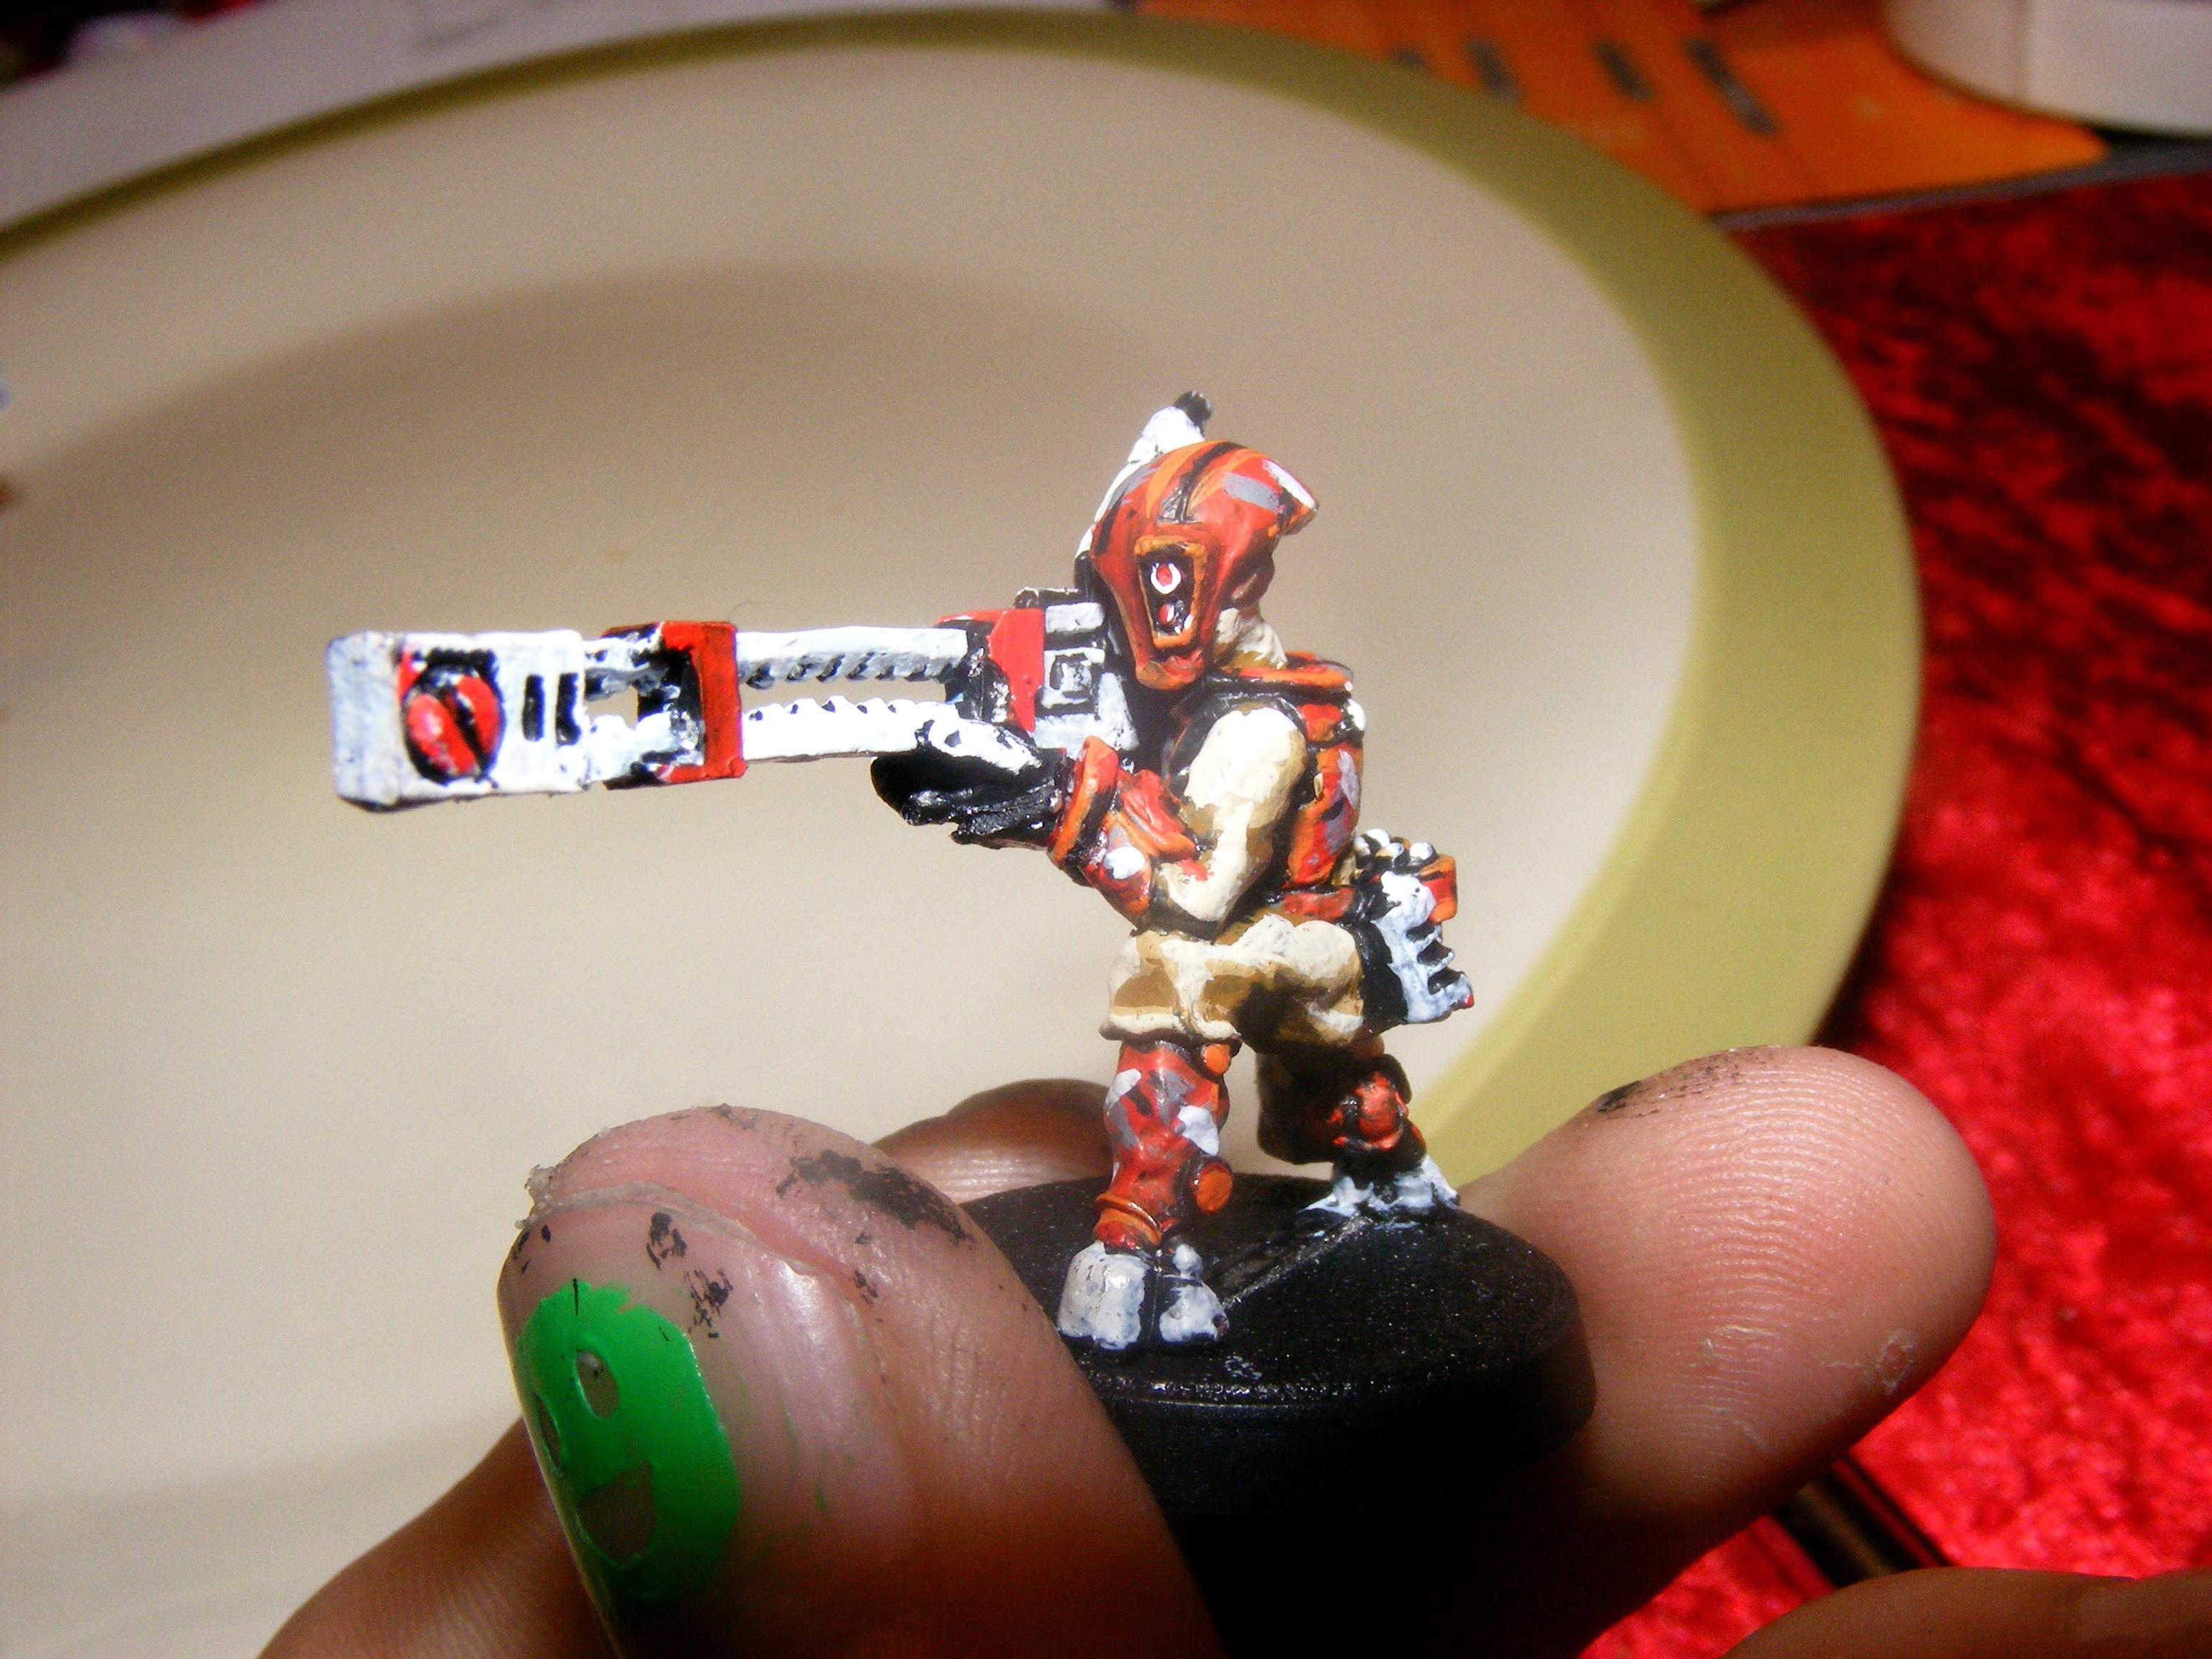 red camo pathfinder crouching